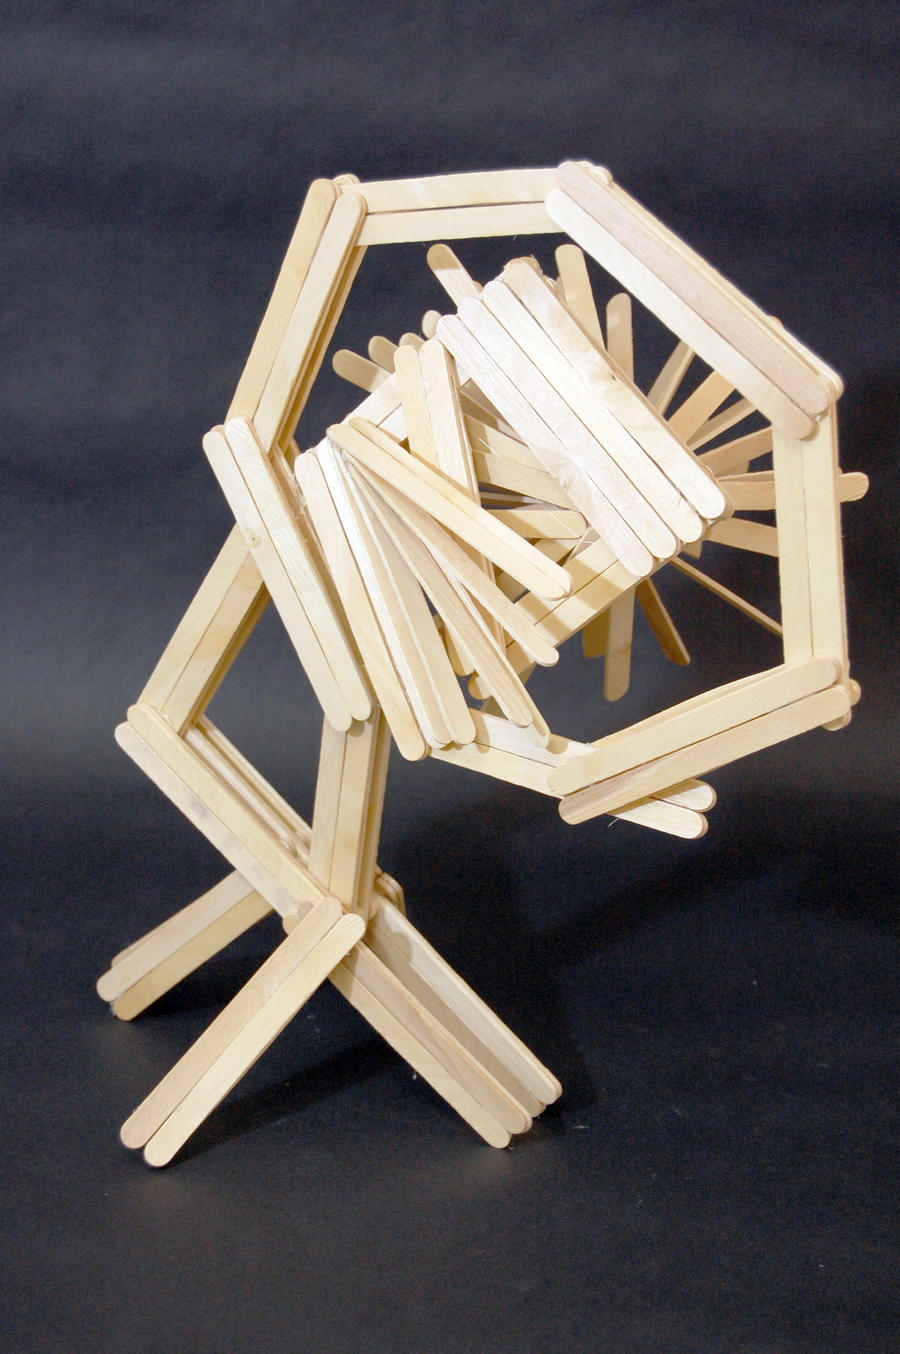 Popsicle Stick Sculpture Burst 1 By Kibumi24